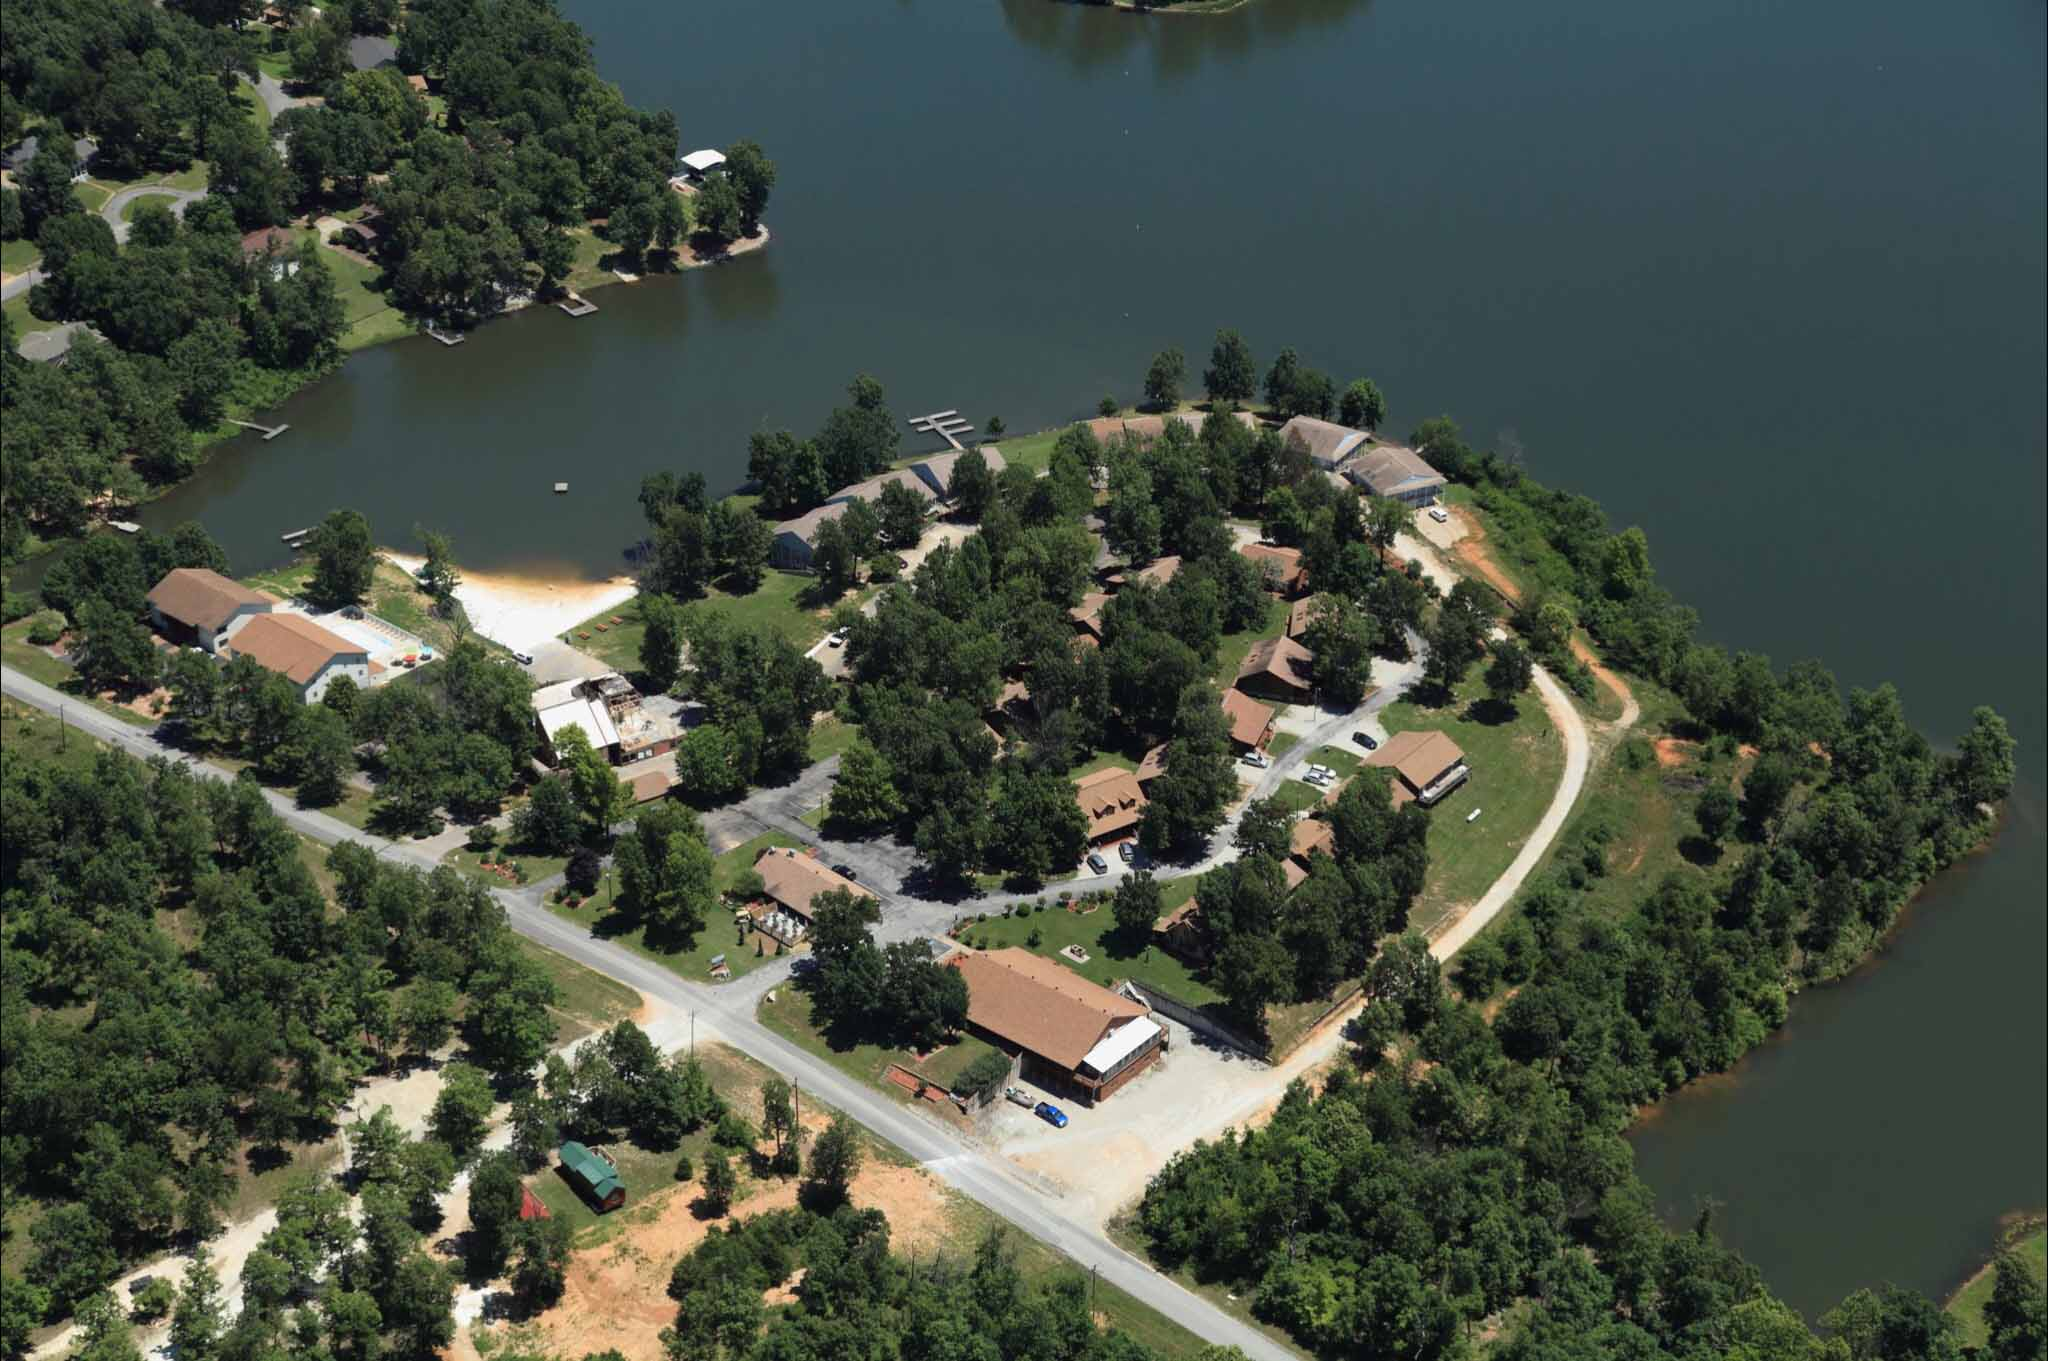 aerial shot of campground on peninsula jutting into lake.